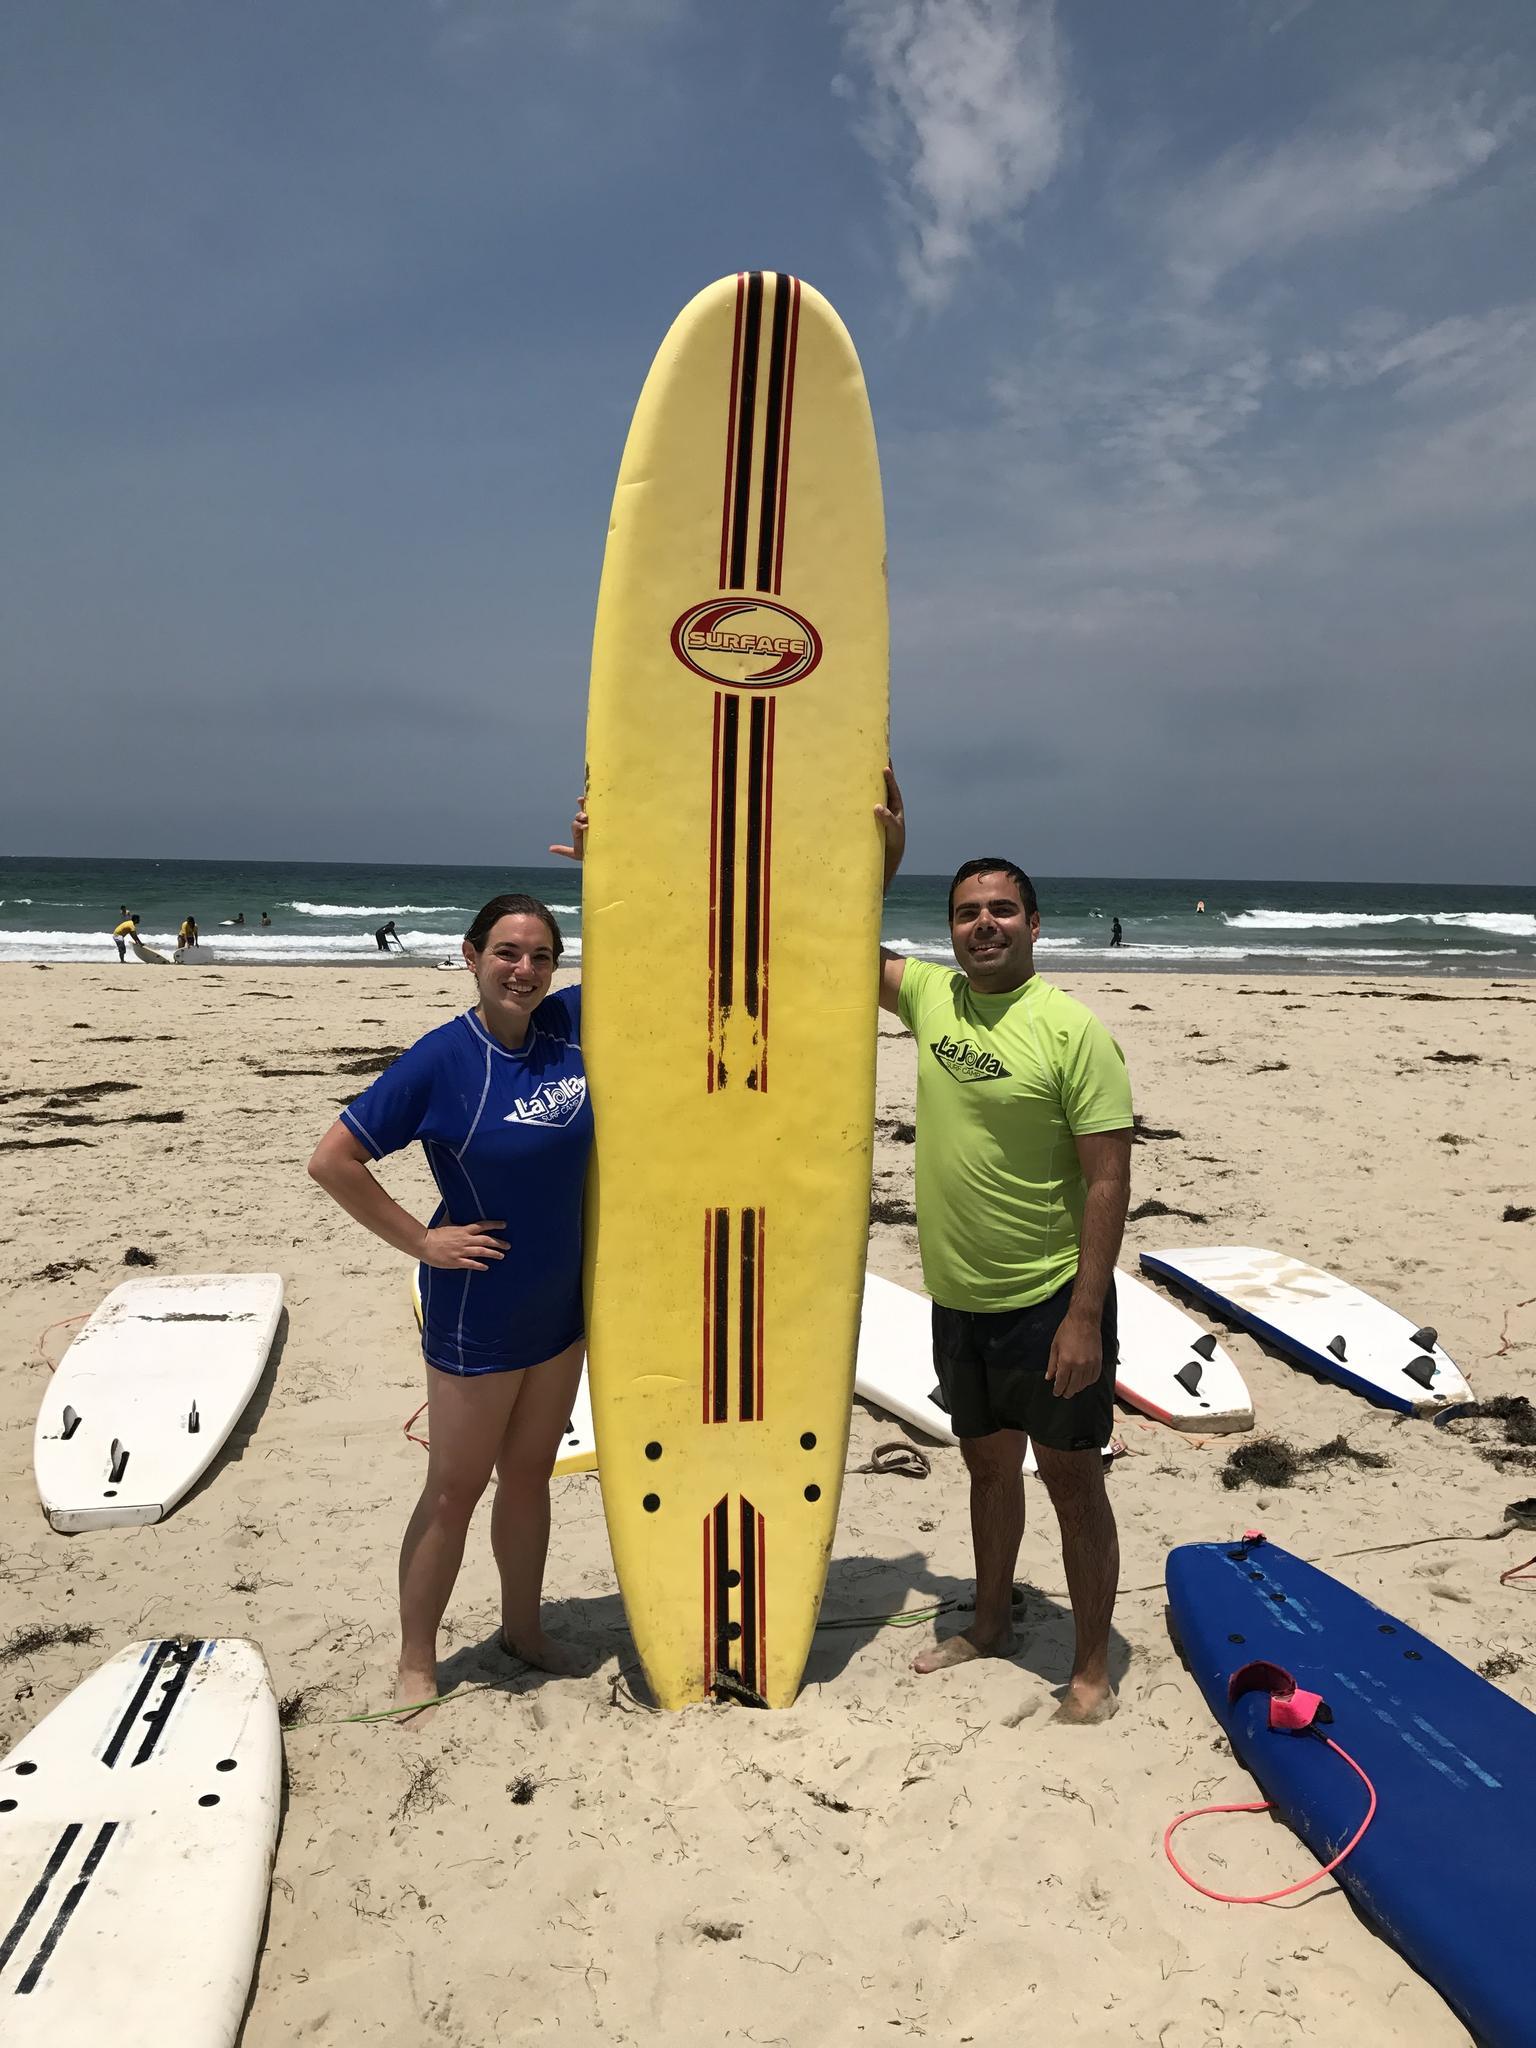 We surf now! (San Diego, CA)